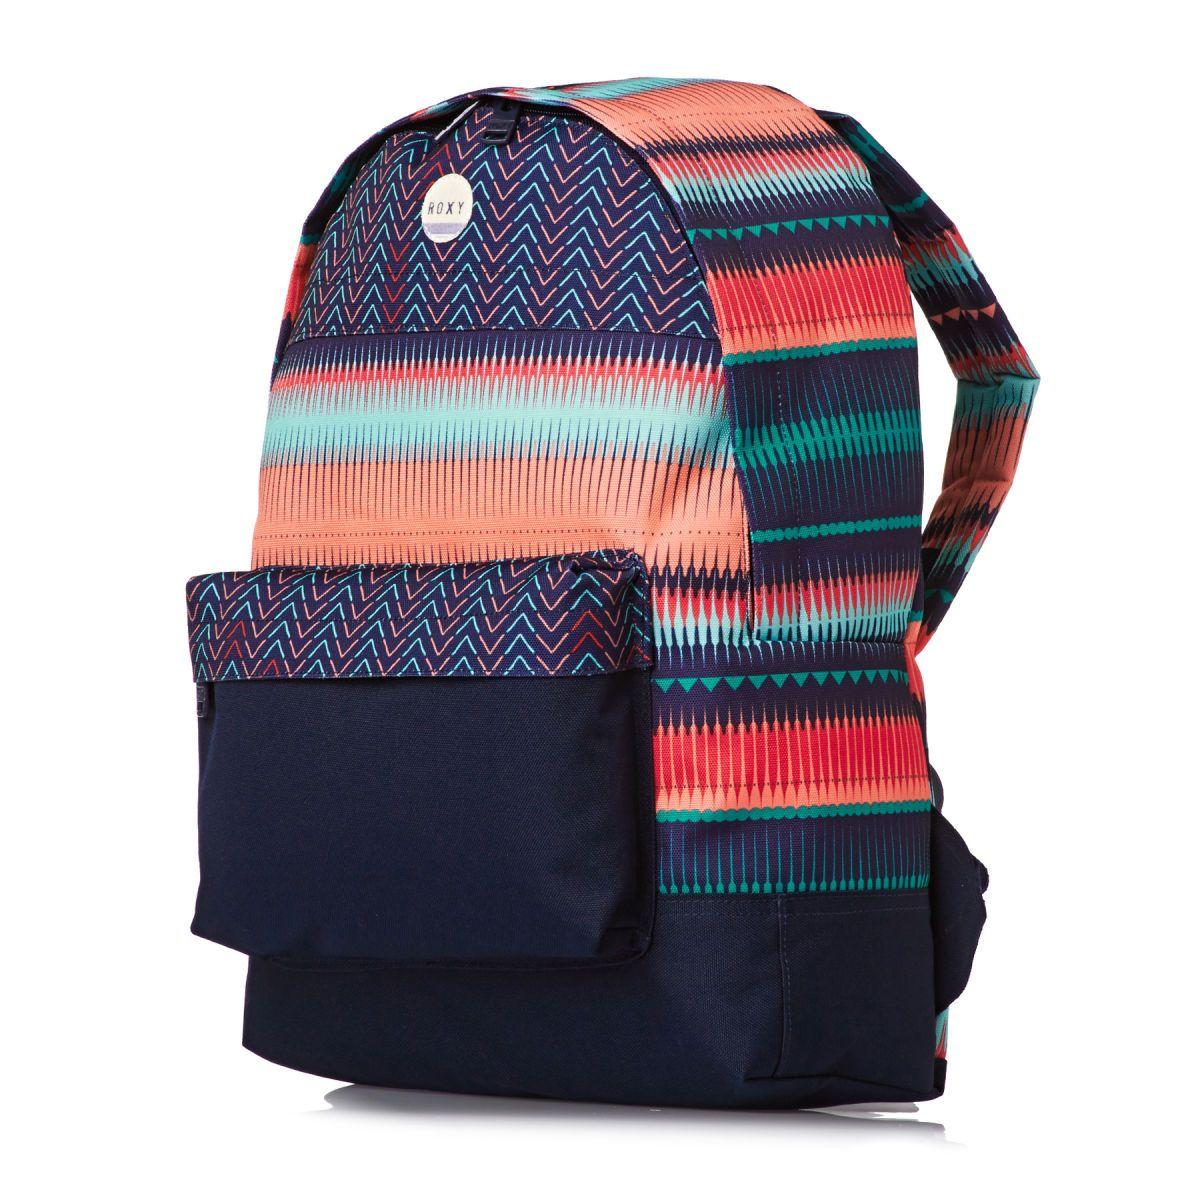 51150ccb128b Roxy Sugar Baby Backpack - 6537 Jagged Stripe Gpf3